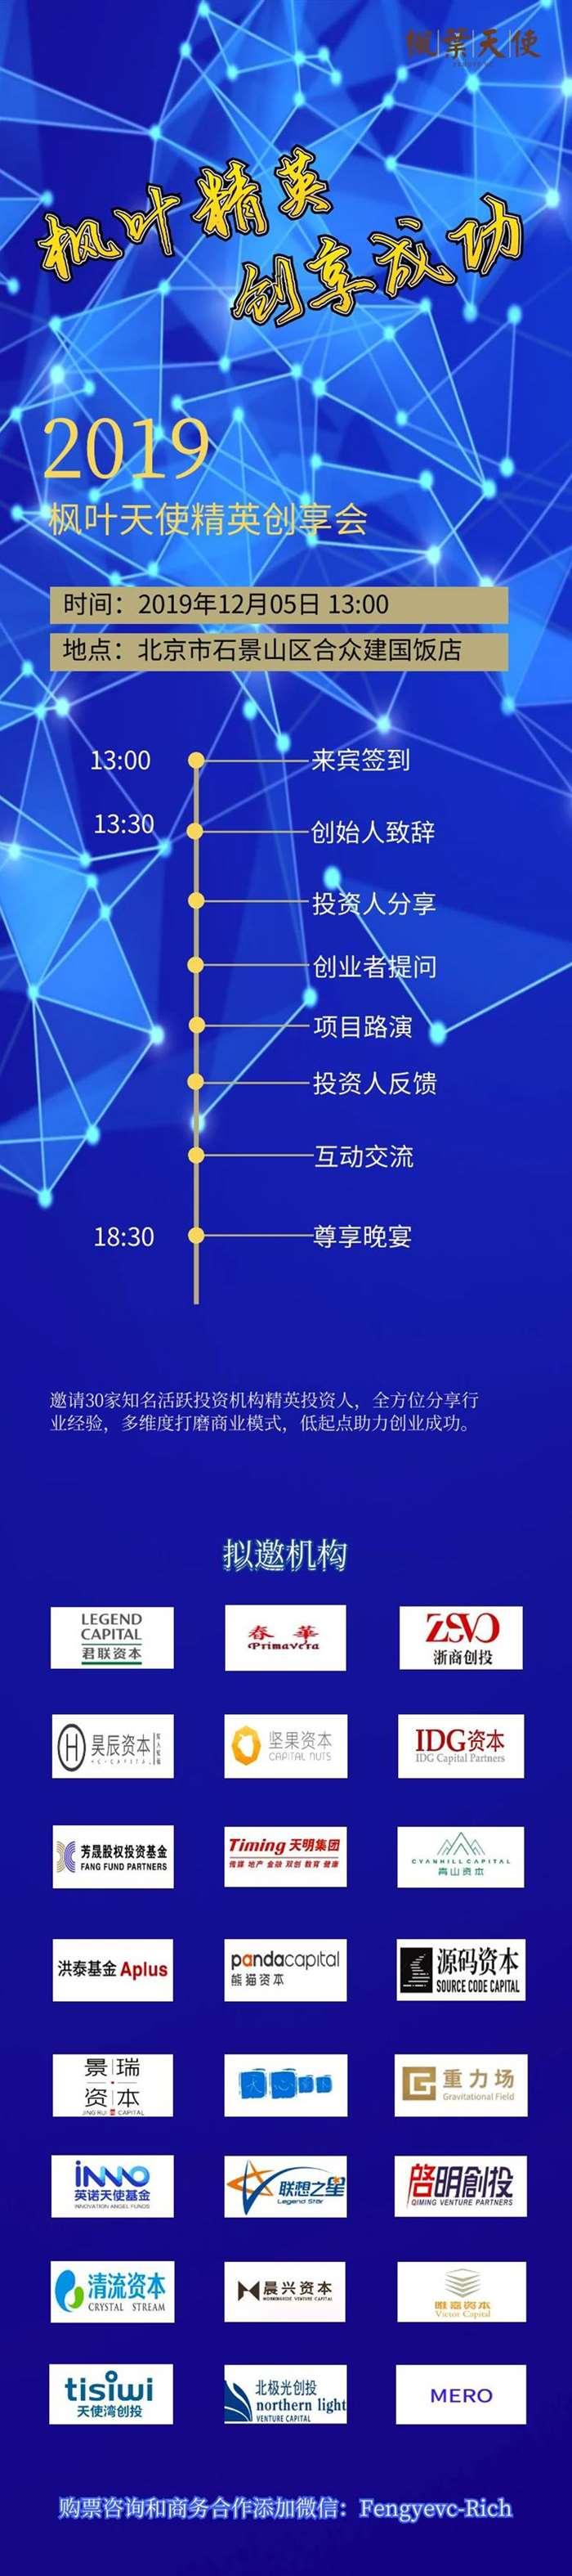 http://www.huodongxing.com/file/20170704/2232741413173/473616441754956.jpg